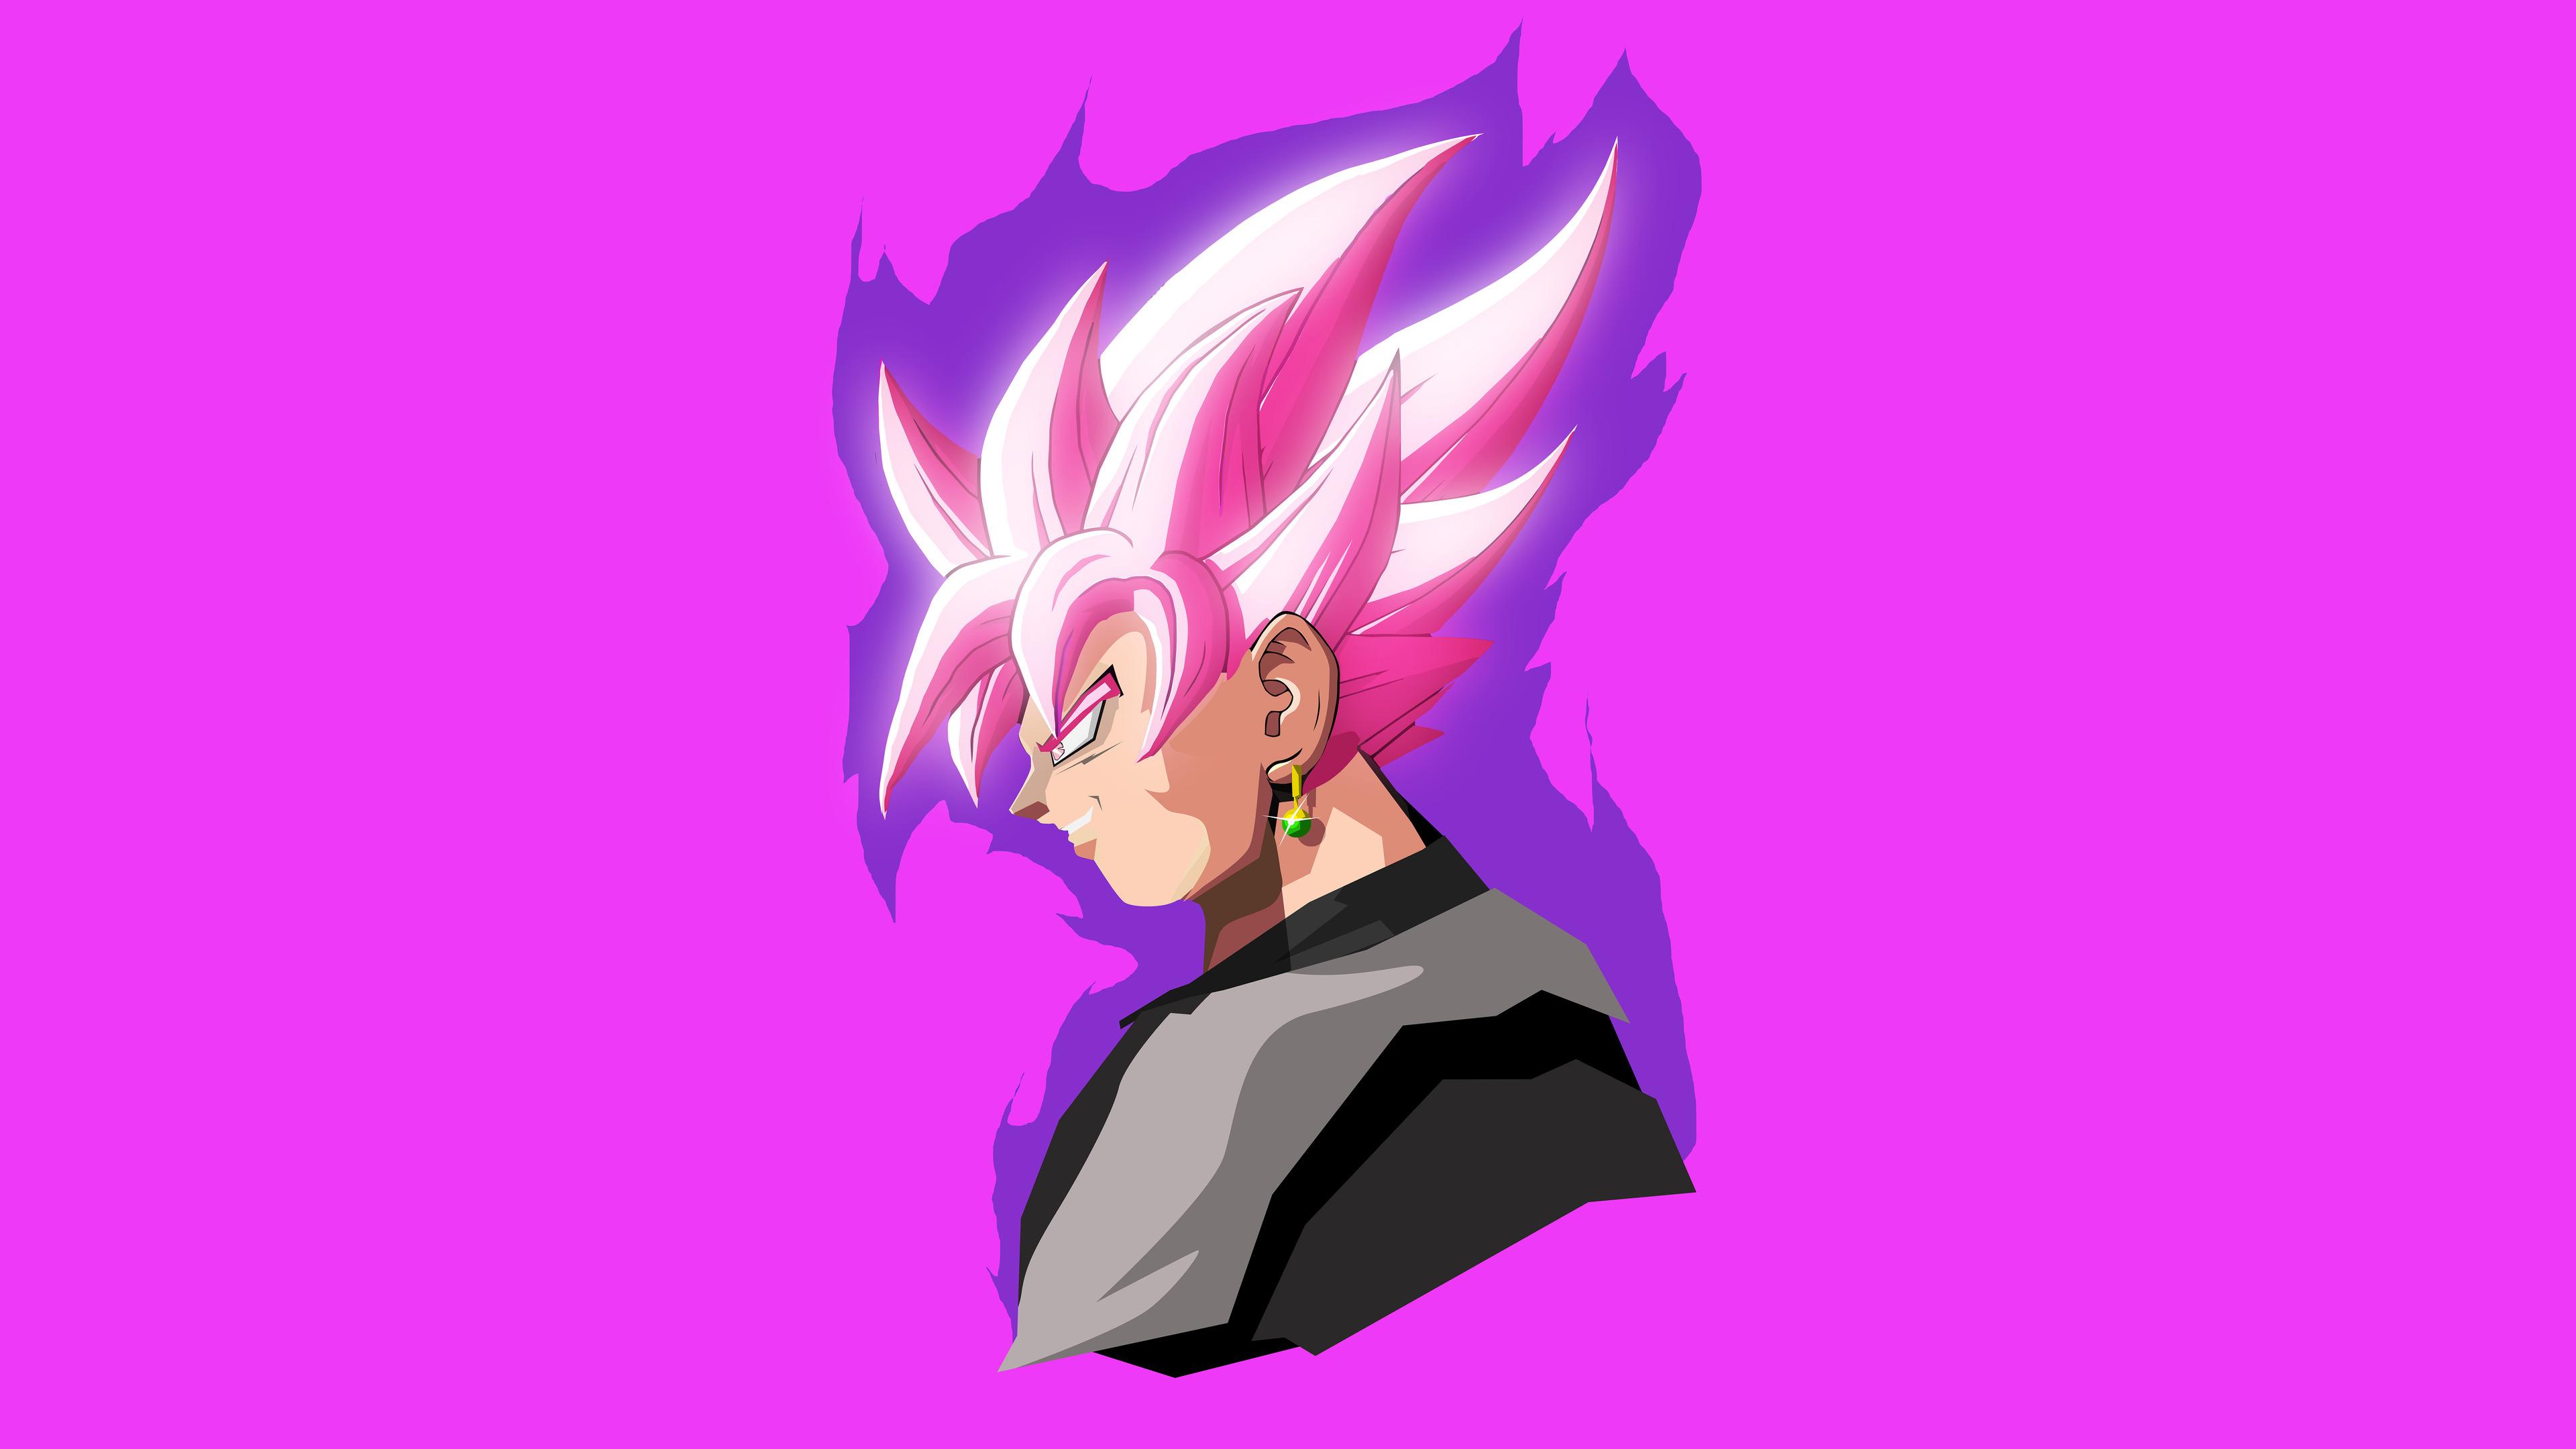 Goku Dragon Ball Super Minimal Artwork 25K 25k Ultra HD Wallpaper ...